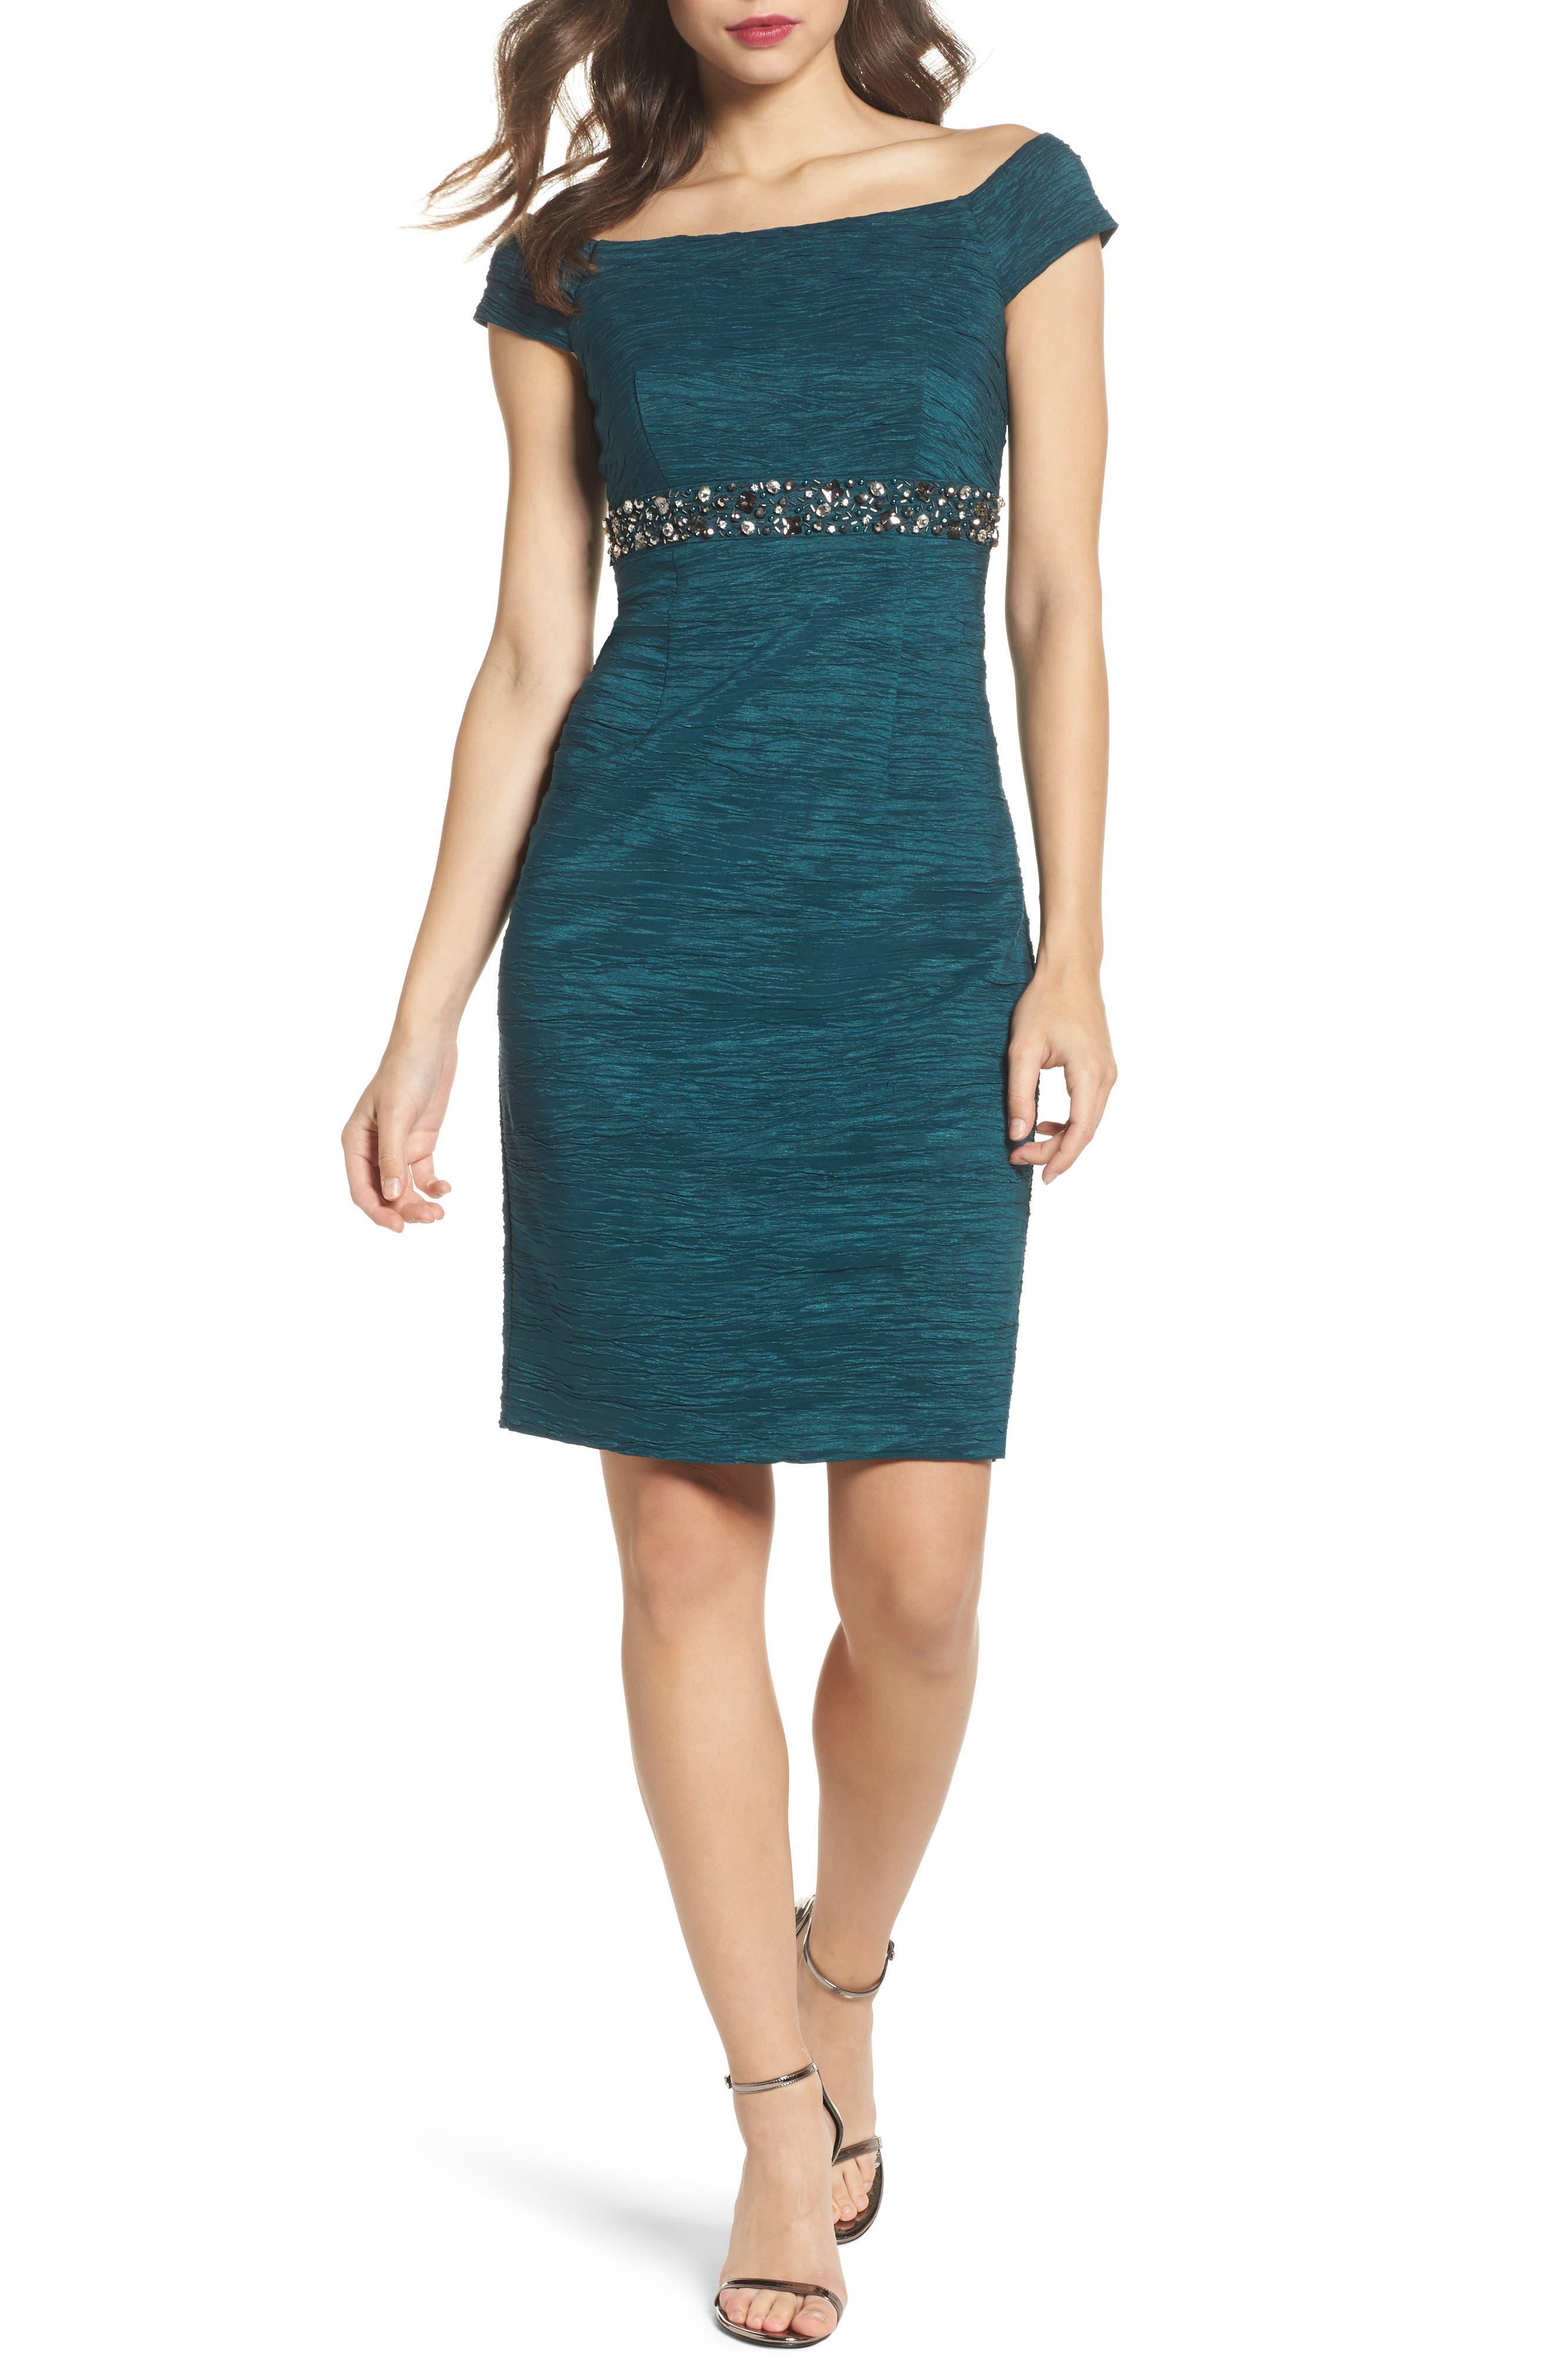 Off the Shoulder Taffeta Dress,                             Main thumbnail 1, color,                             302